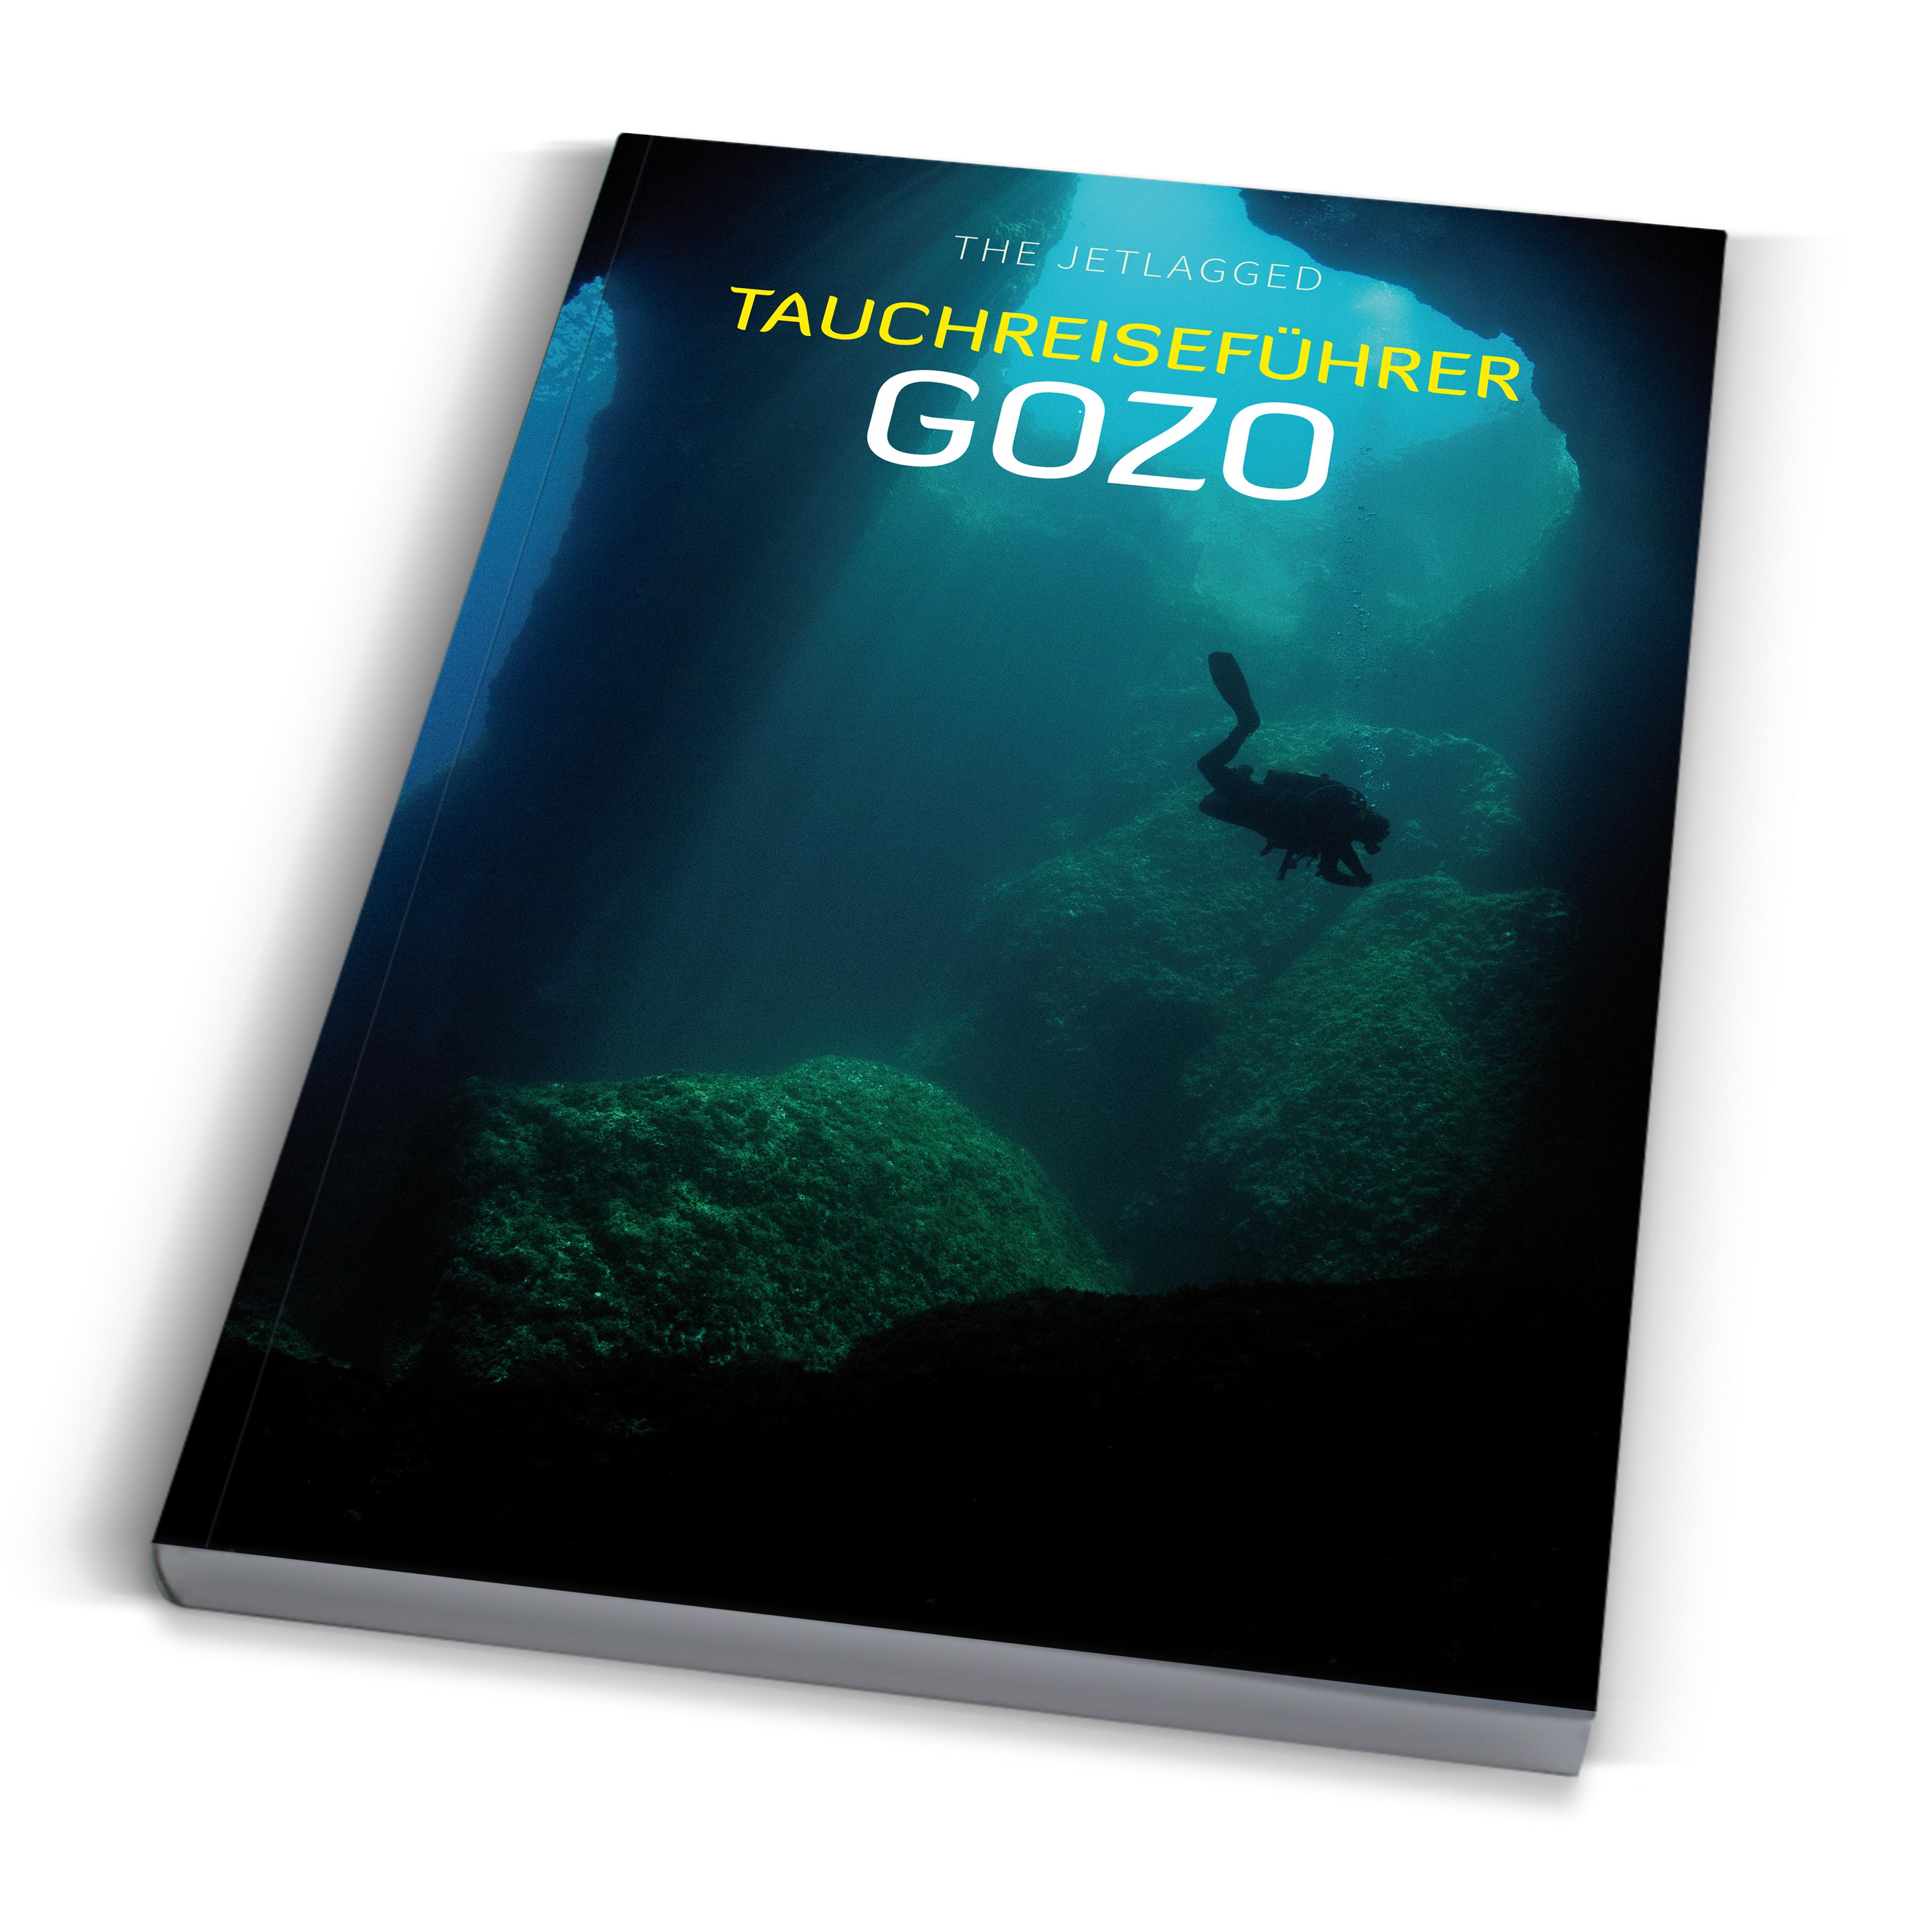 Tauchreiseführer Gozo